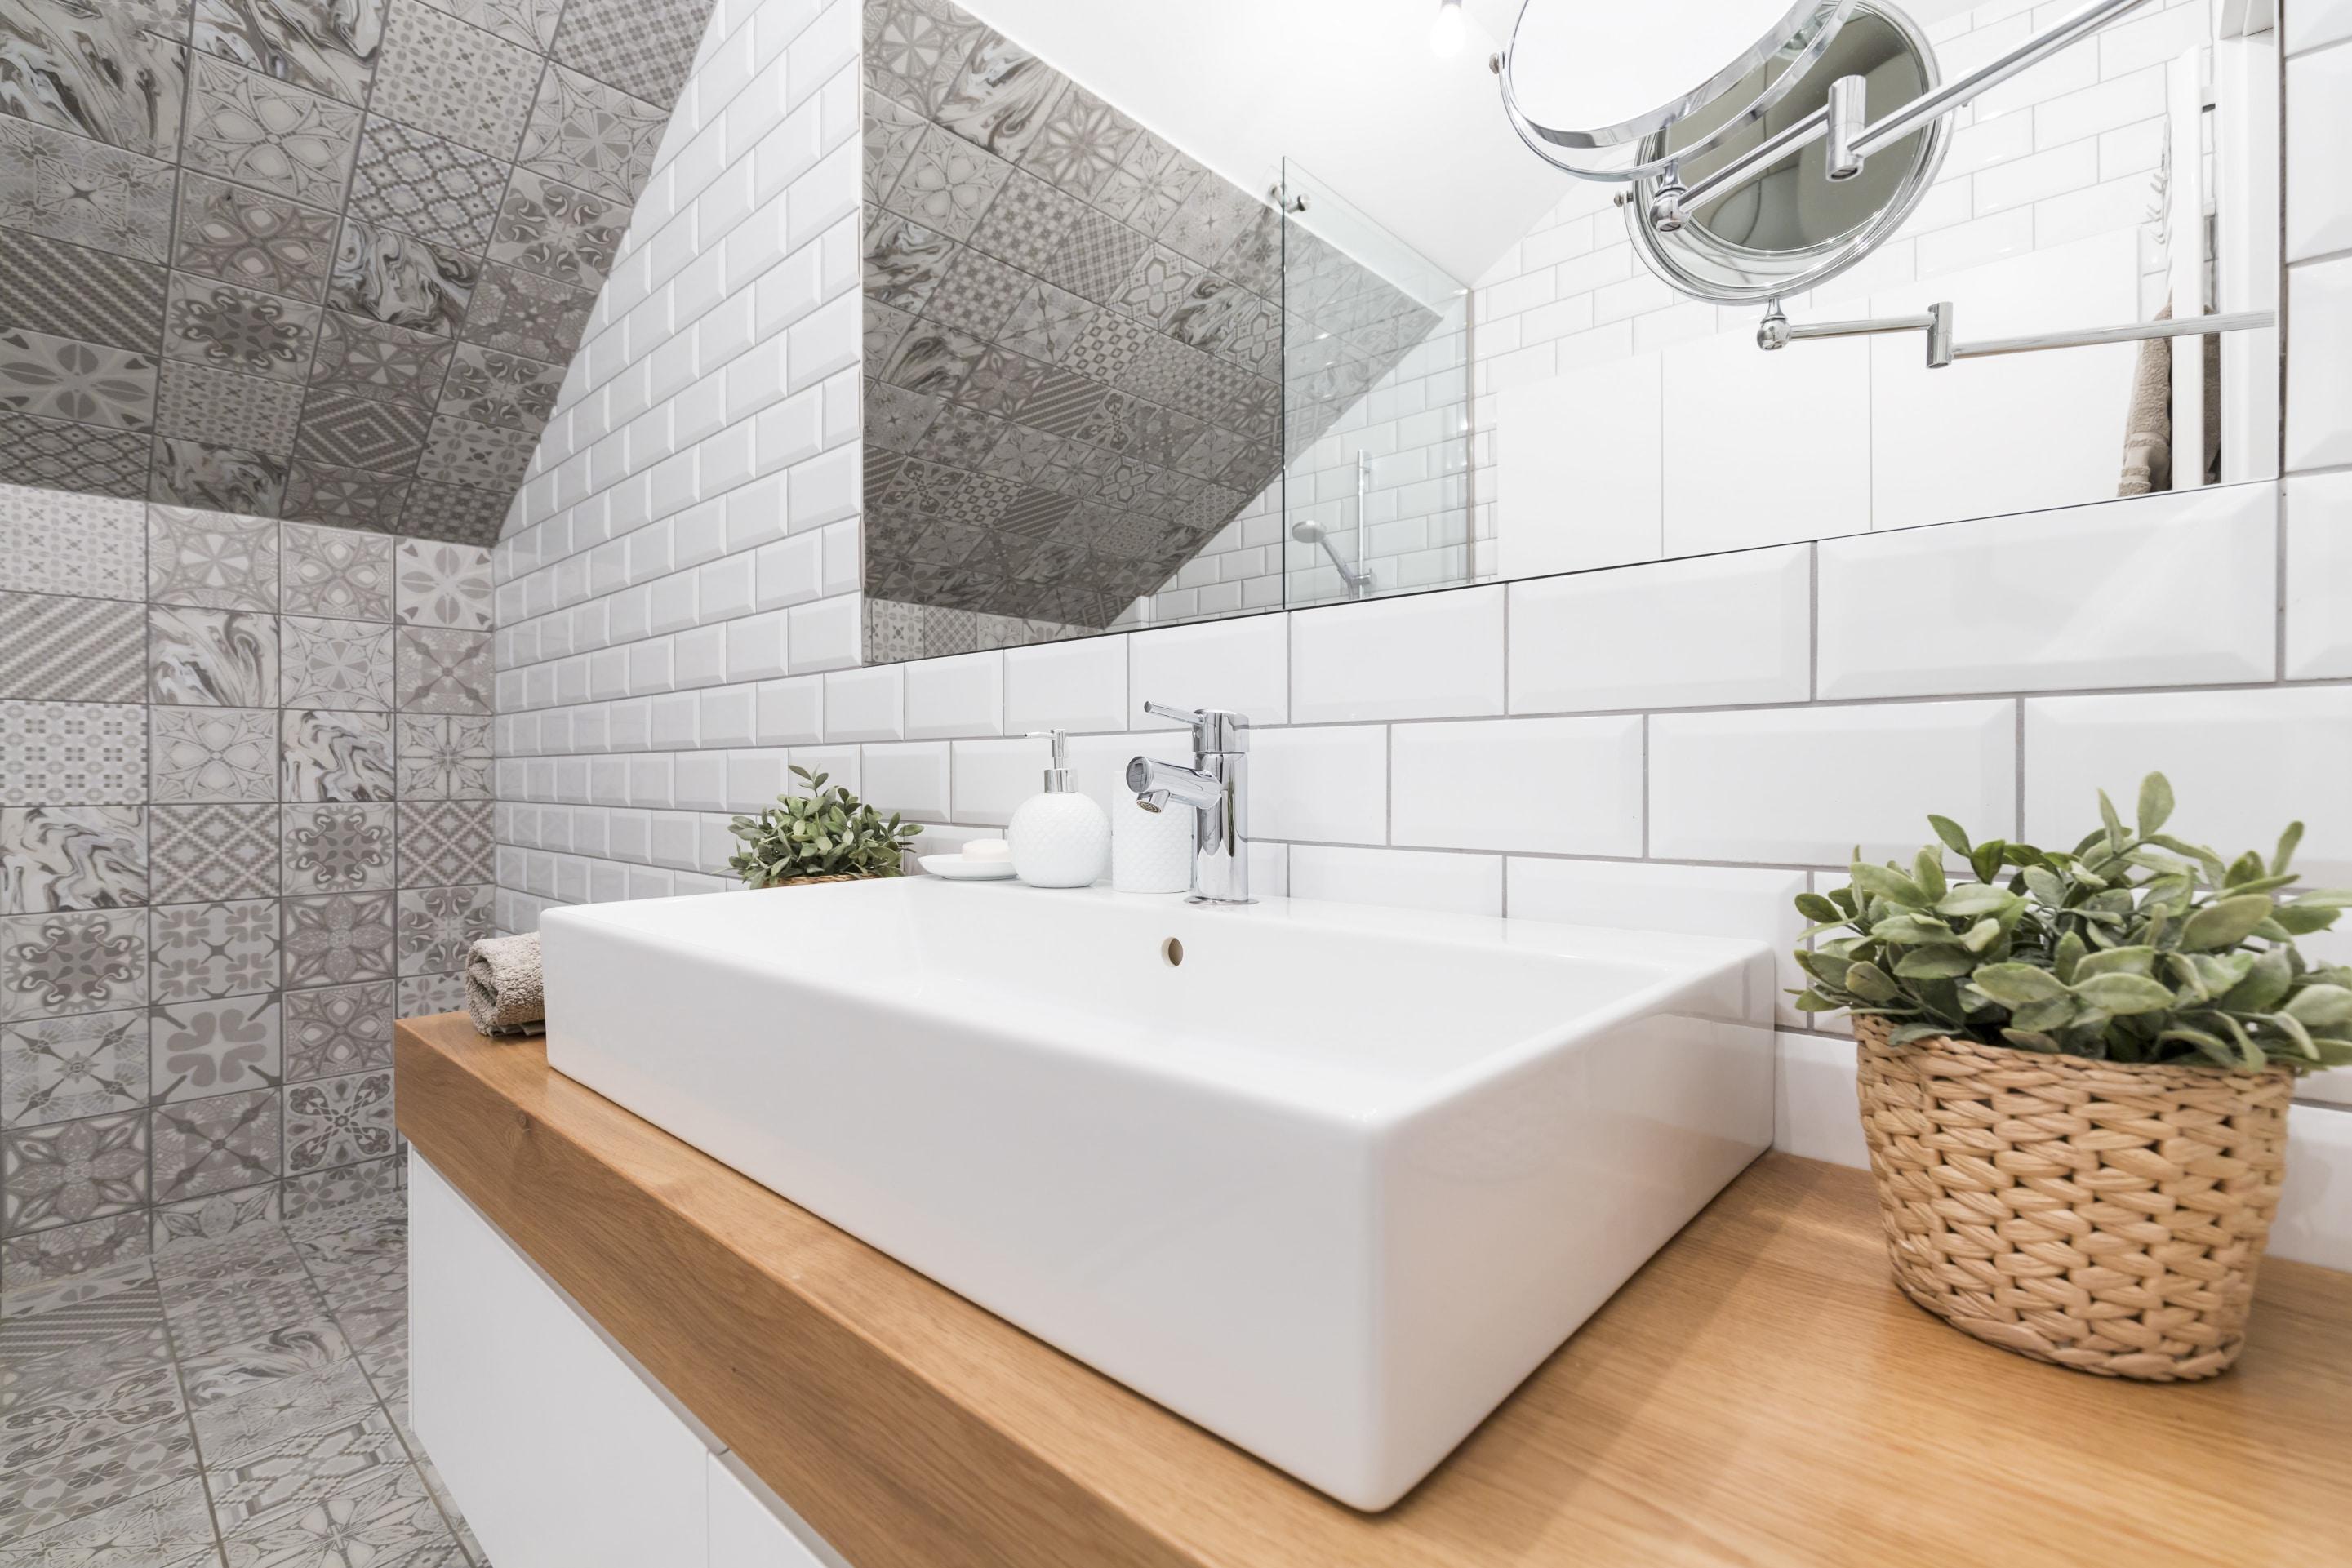 Faillance Salle De Bain prix de pose d'un carrelage mural pour salle de bain